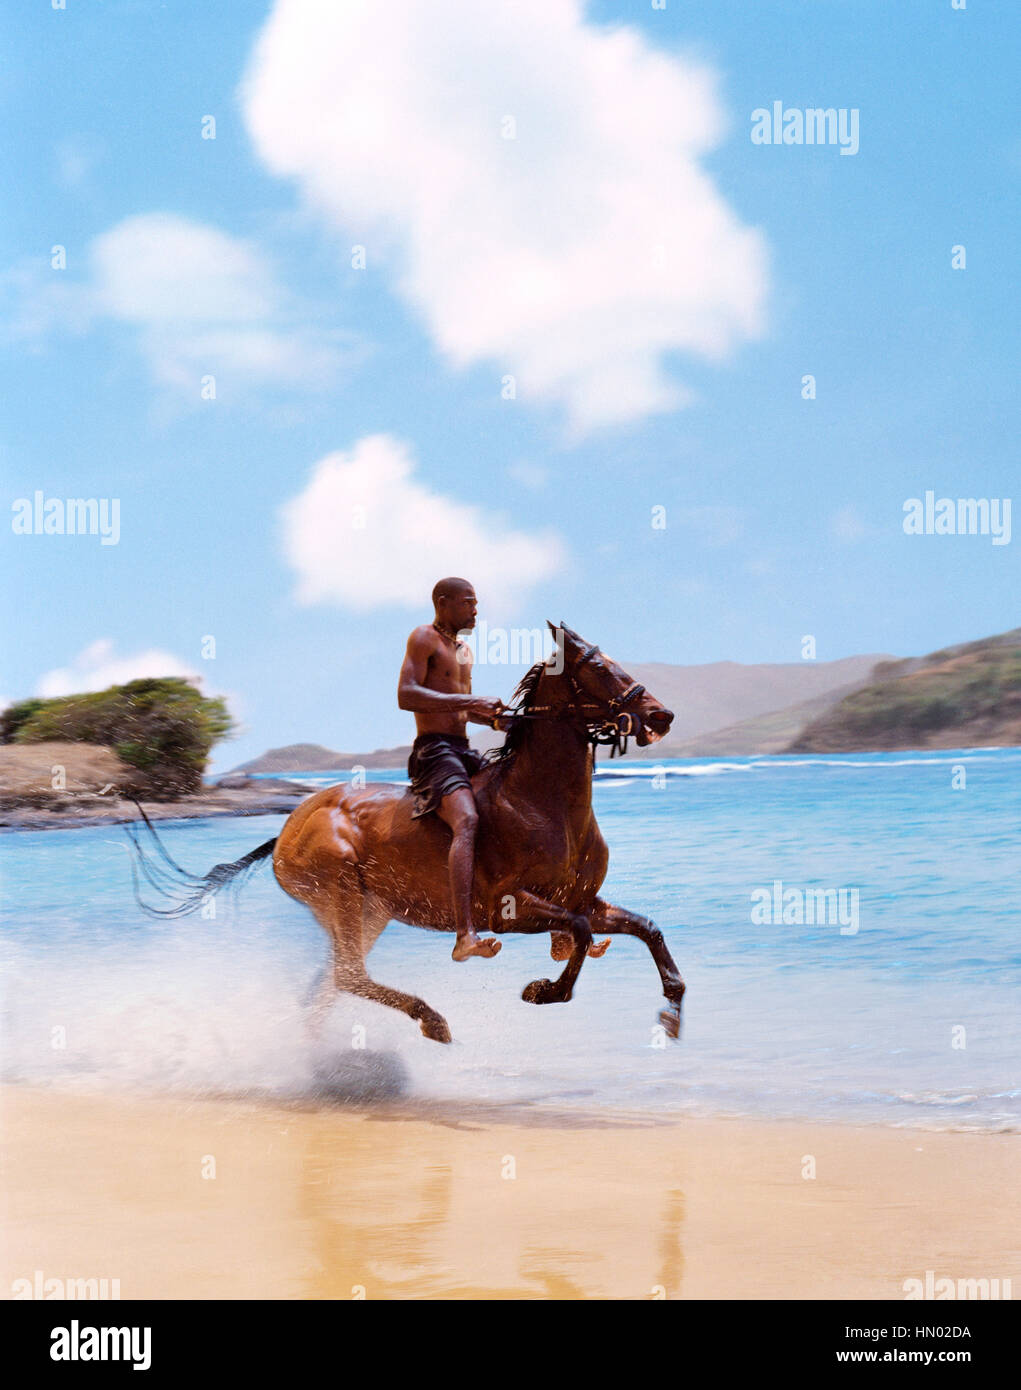 International Pony Club co-owner Alvin Phillipp rides a horse down Cas-En-Bas Beach. St. Lucia. - Stock Image